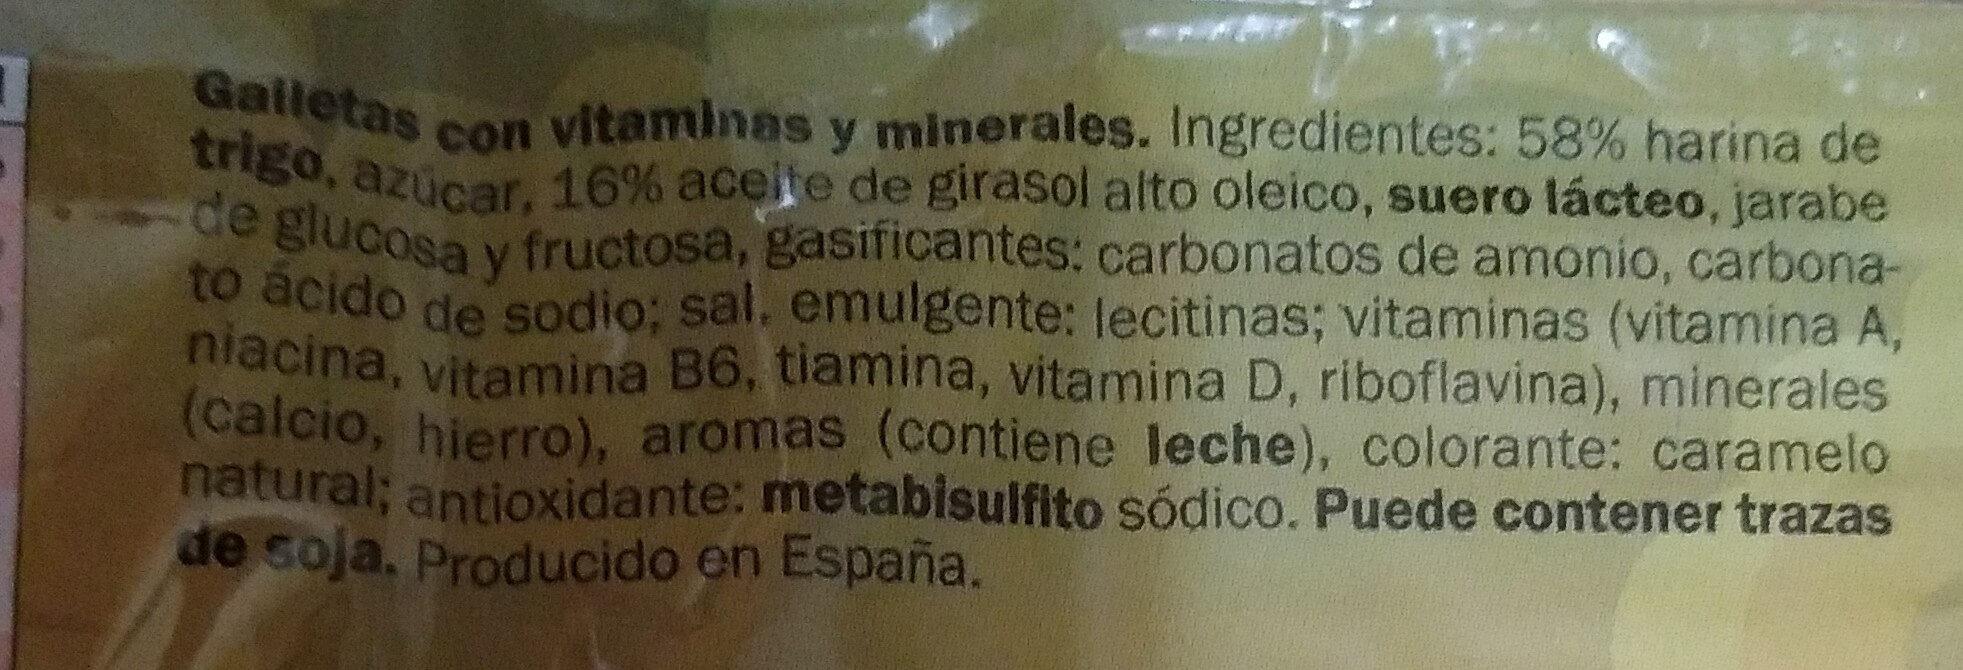 Galle totem - Ingredientes - es